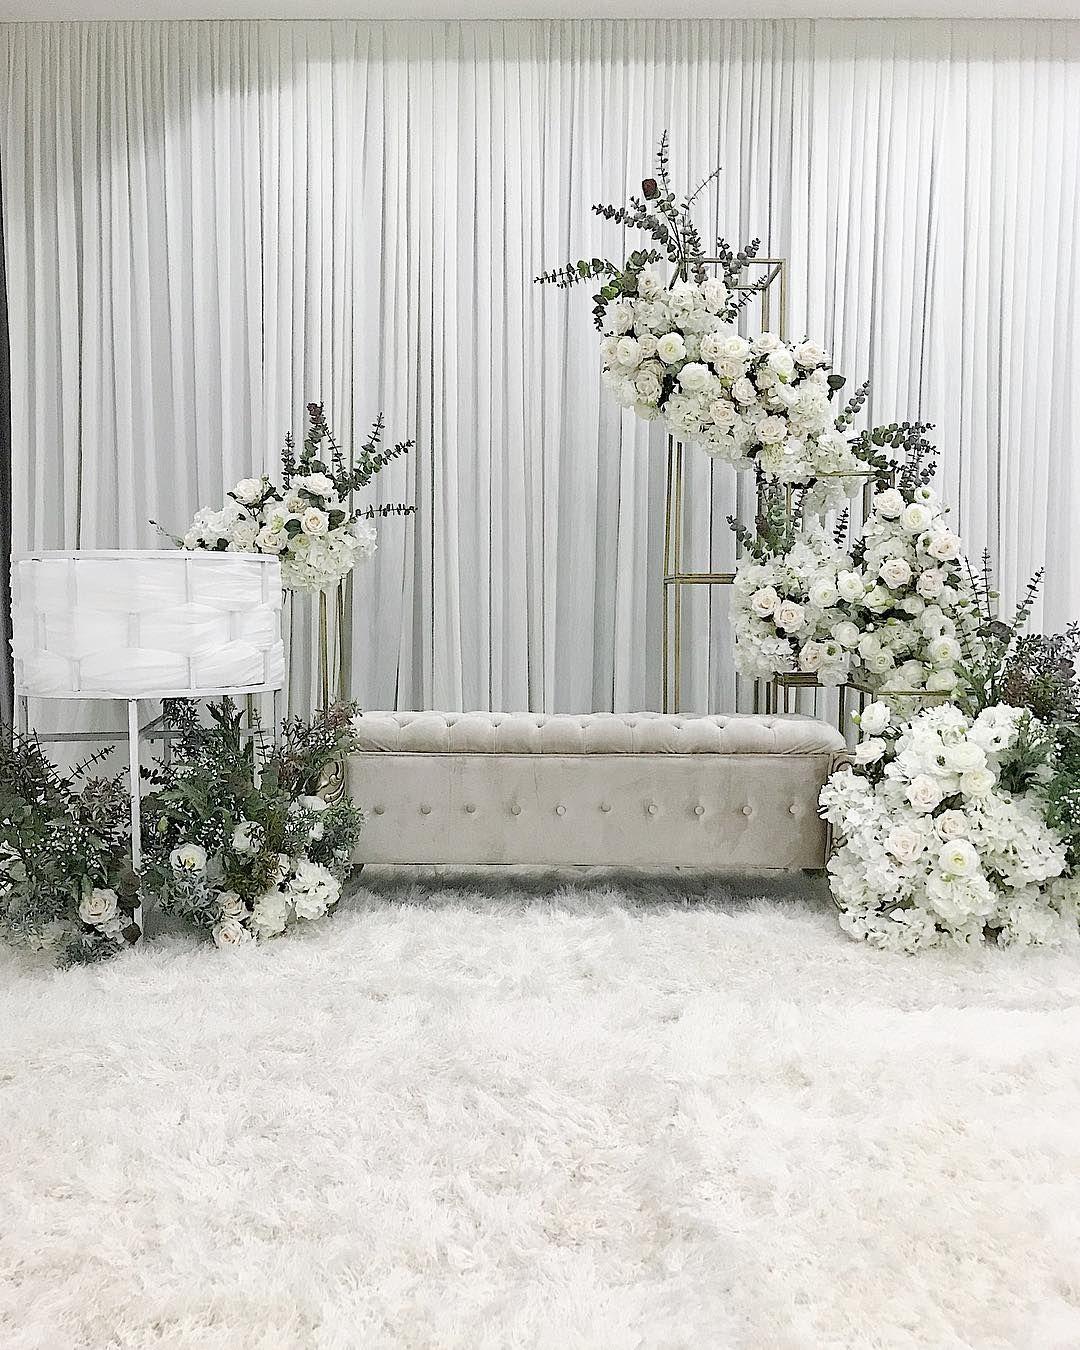 Wedding Nikah Simple Backdrop Decoration Muslim: Aqiqah Dais For Baby Zaim Shah Alam… In 2020